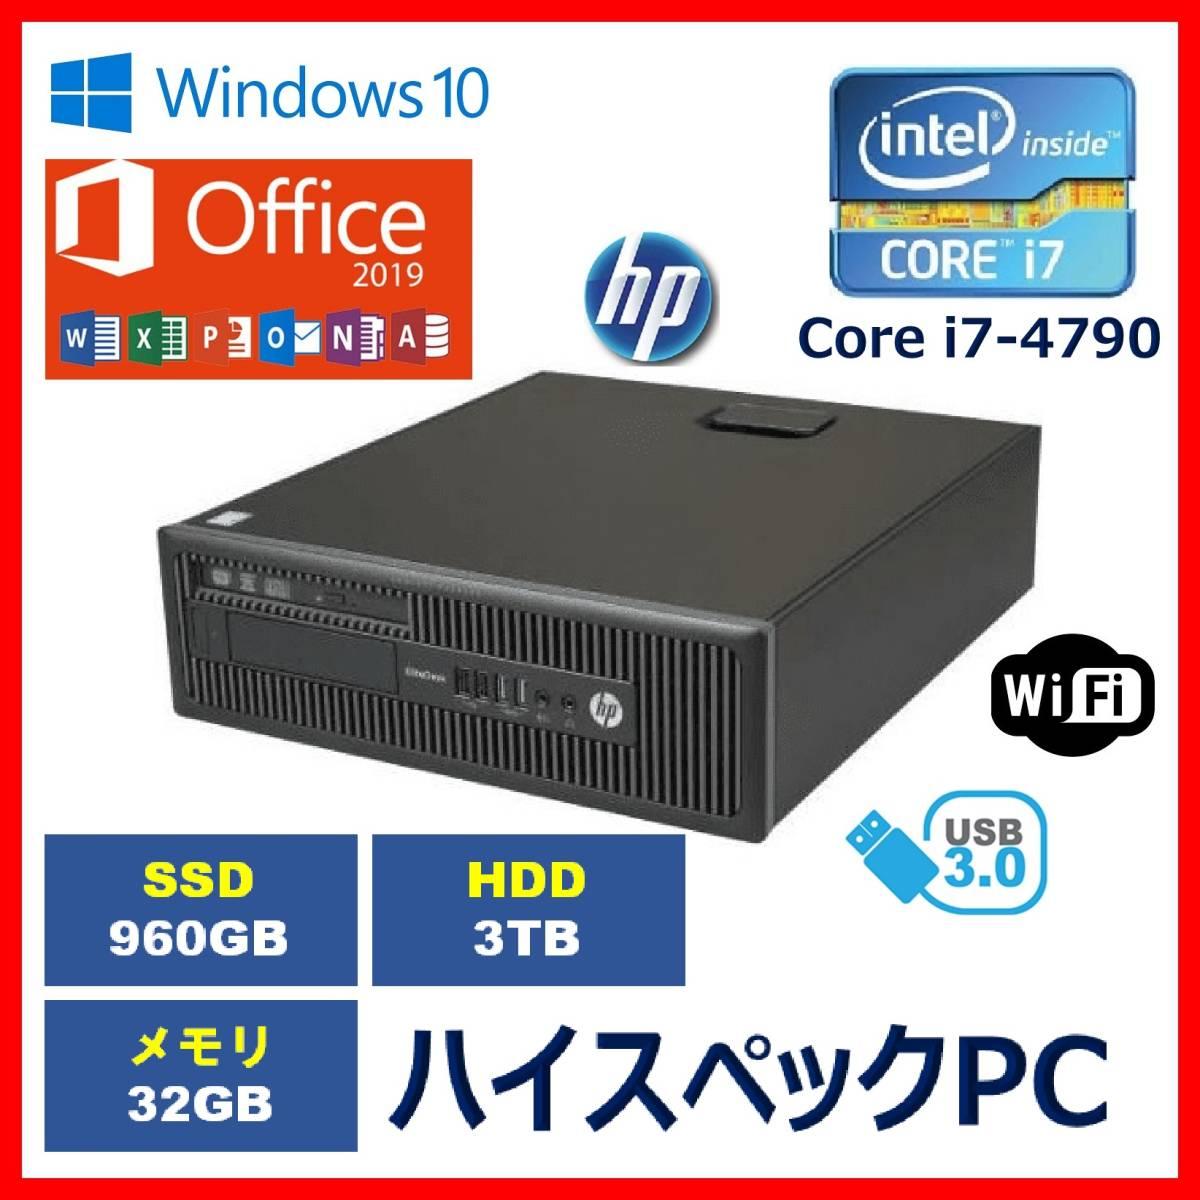 ●究極 i7-4790(4.0Gx8)●メモリ32GB●新品SSD960GB+HDD3TB●無線LAN(Wi-Fi)●USB3.0●2画面●静音●最新Win10●MS Office Pro 2019●